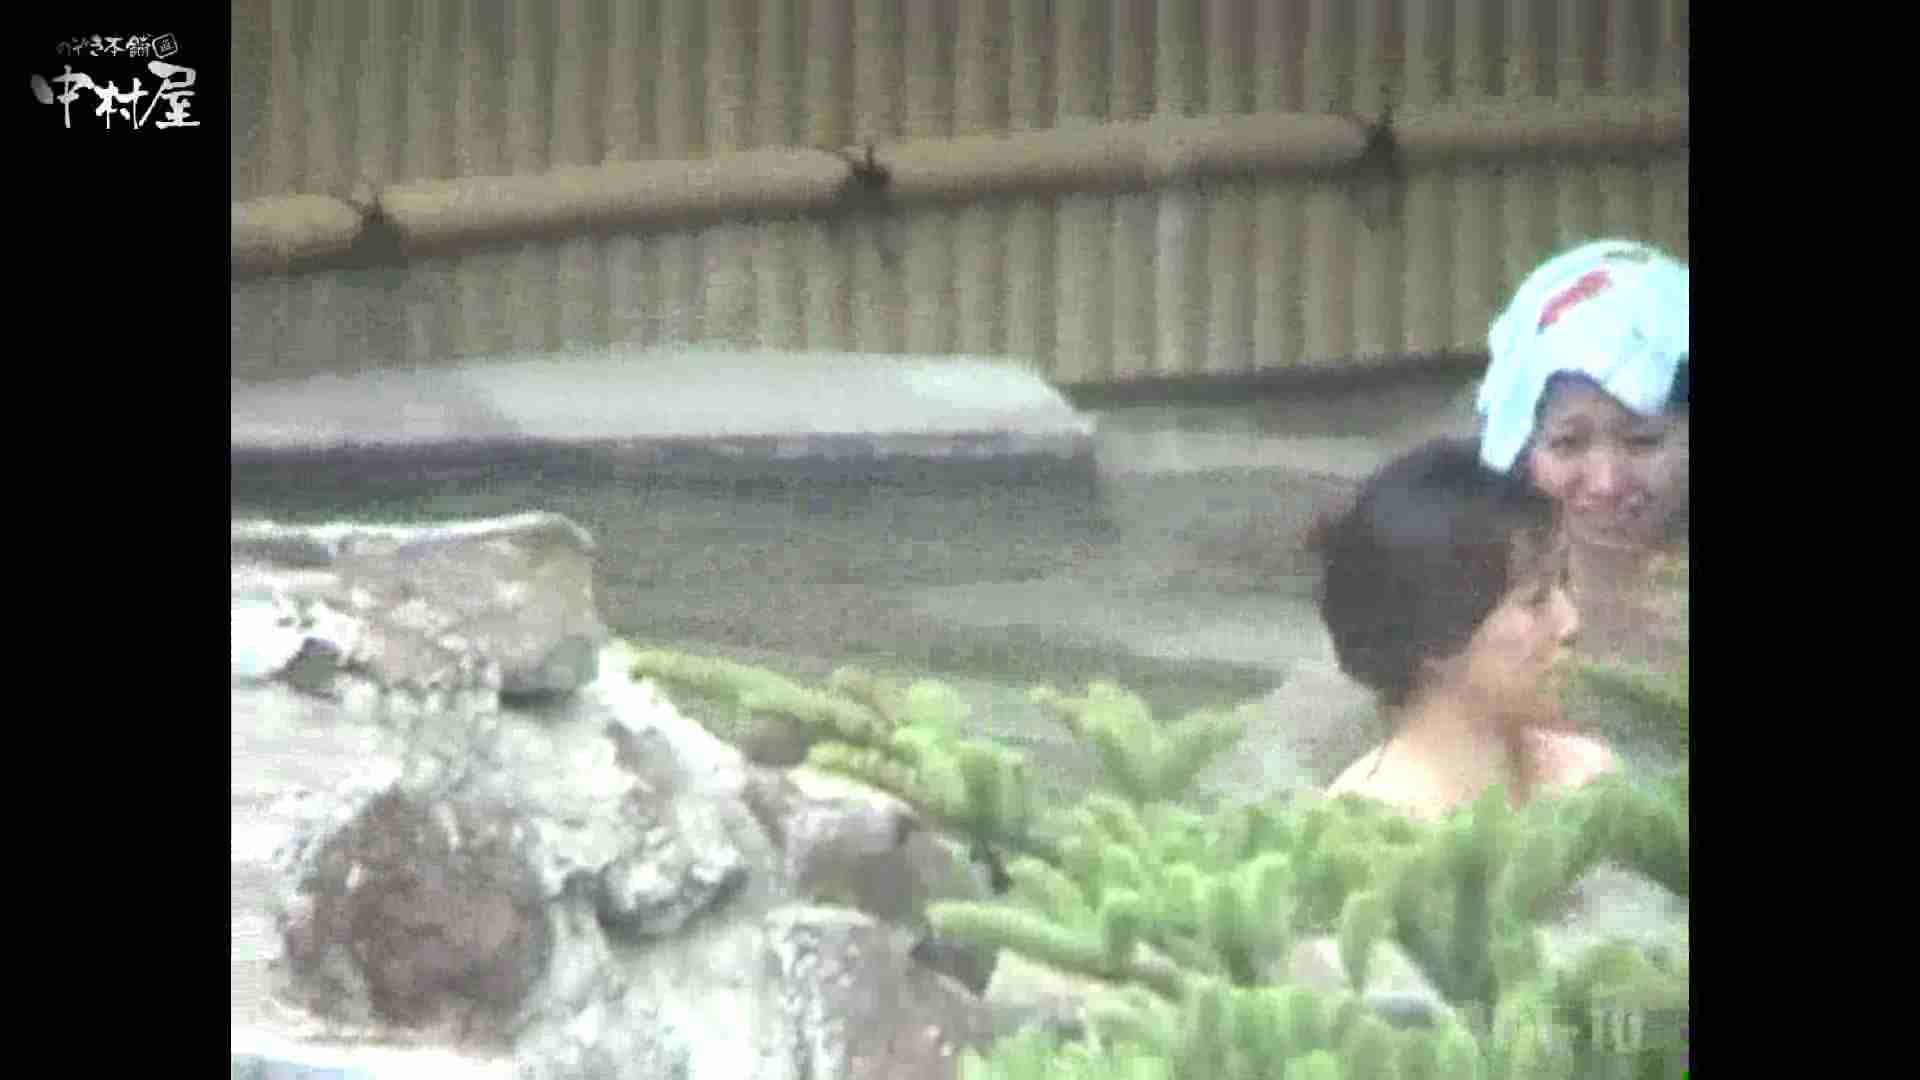 Aquaな露天風呂Vol.874潜入盗撮露天風呂十判湯 其の四 露天 オメコ動画キャプチャ 108画像 35